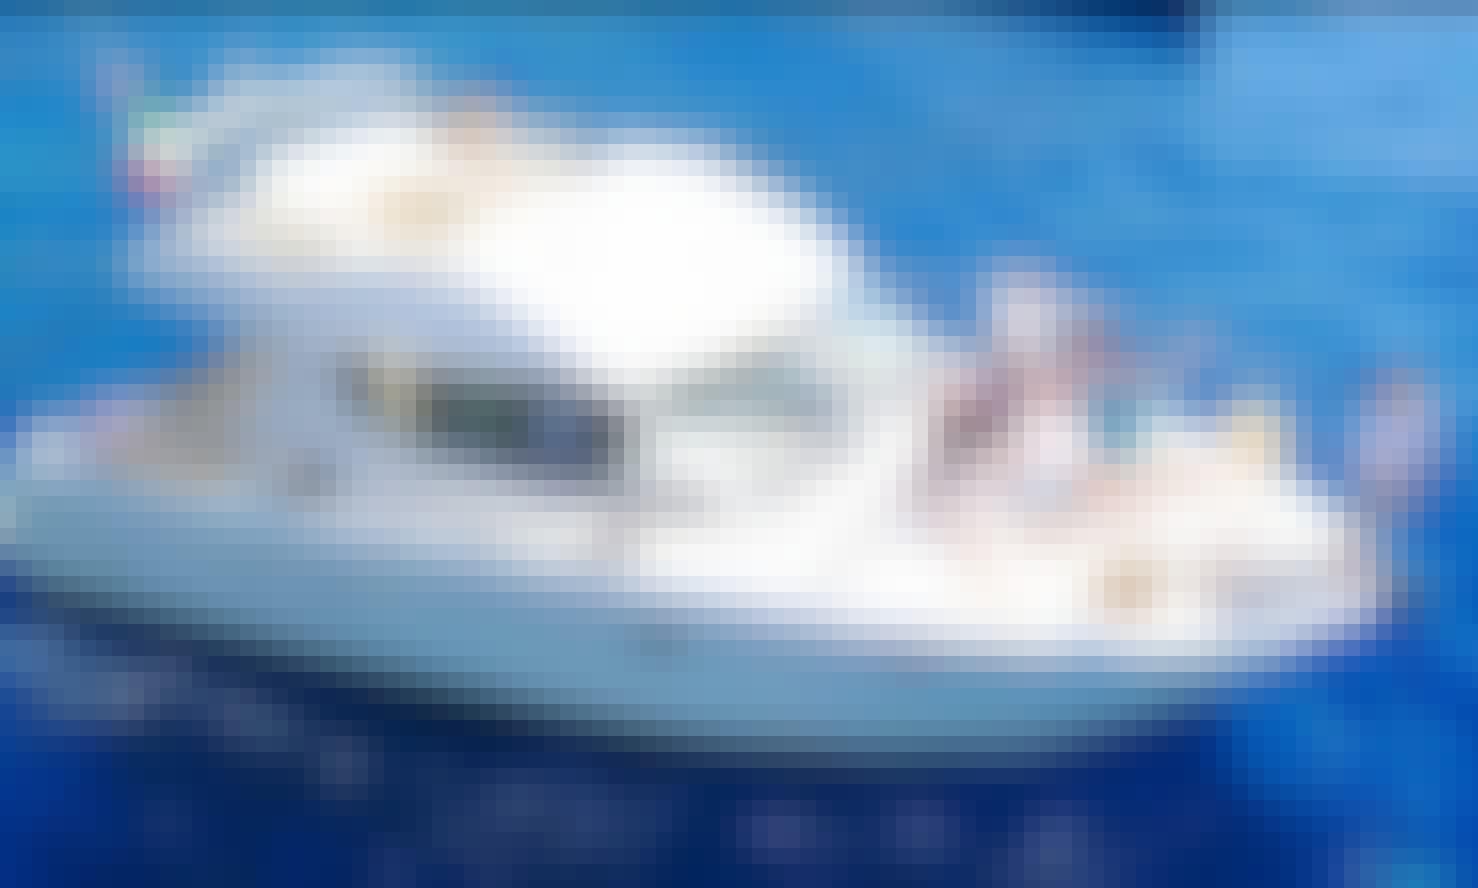 Capri Private Boat Experience Aboard The 36' Jeanneau Prestige Motor Yacht